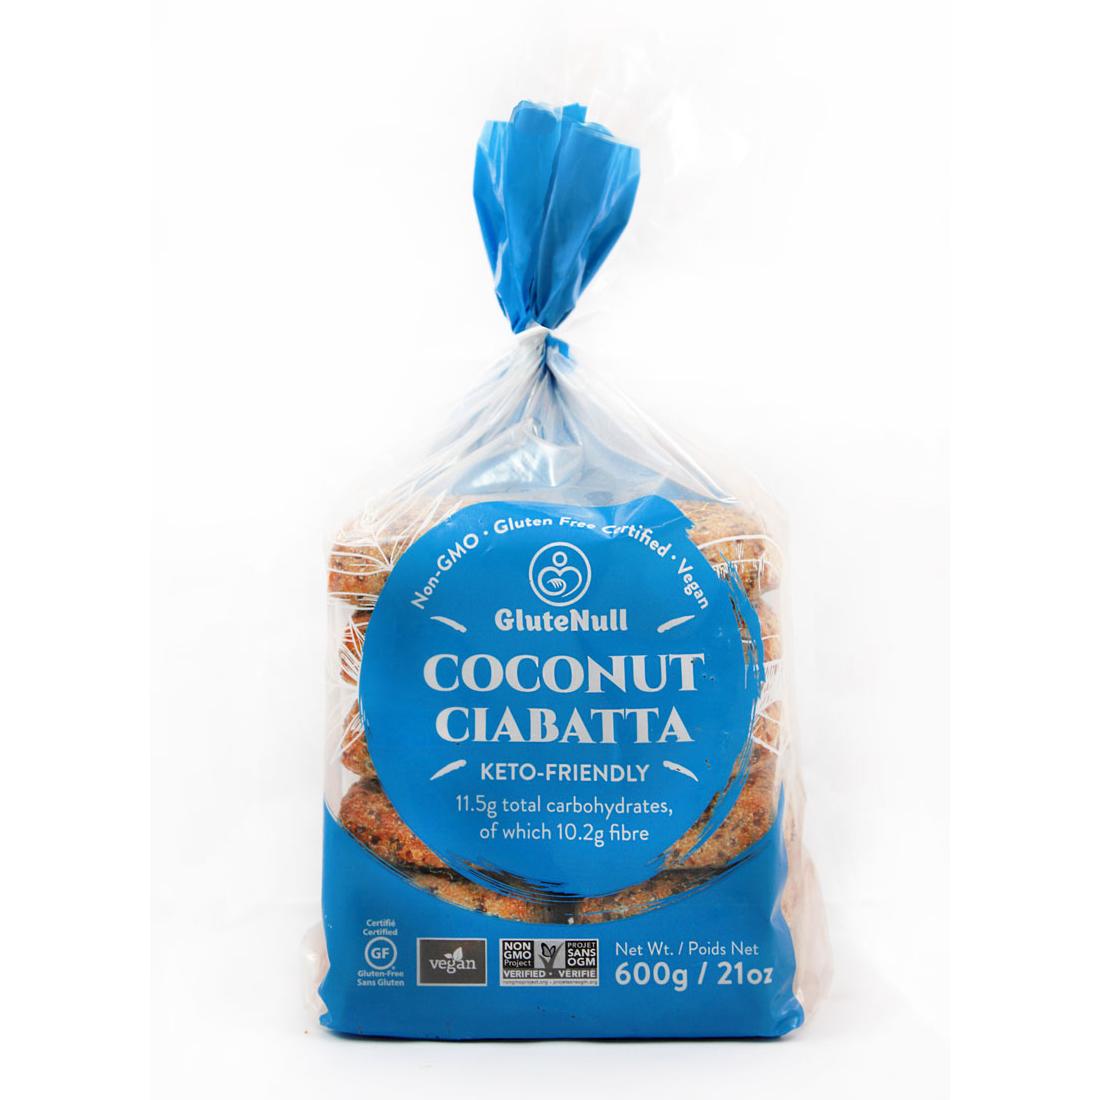 Coconut Ciabatta - Glutenull - Keto Certified by the Paleo Foundation